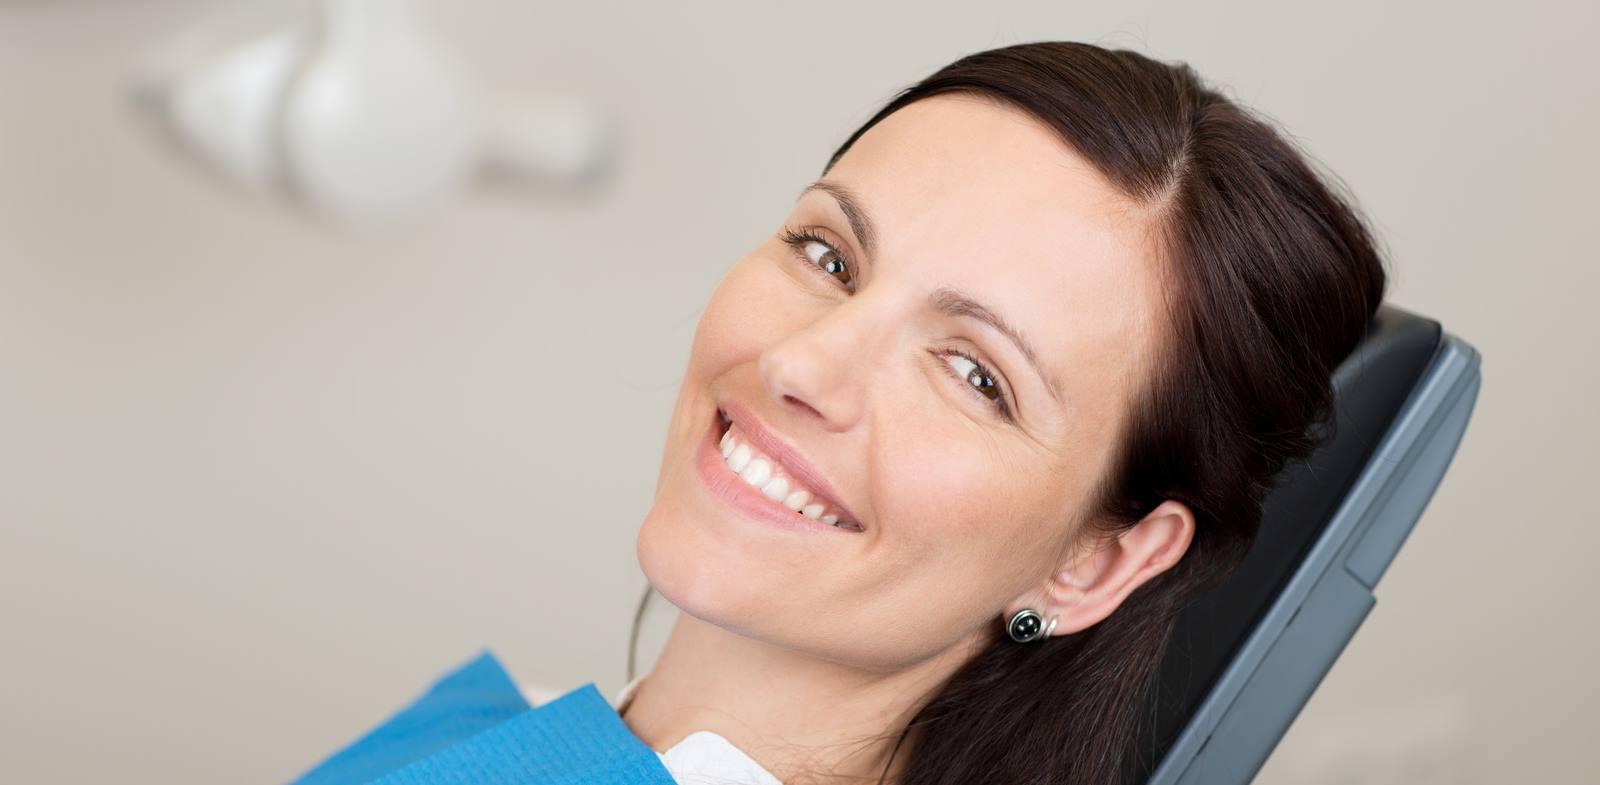 Seduta Igiene Dentale Busto Arsizio